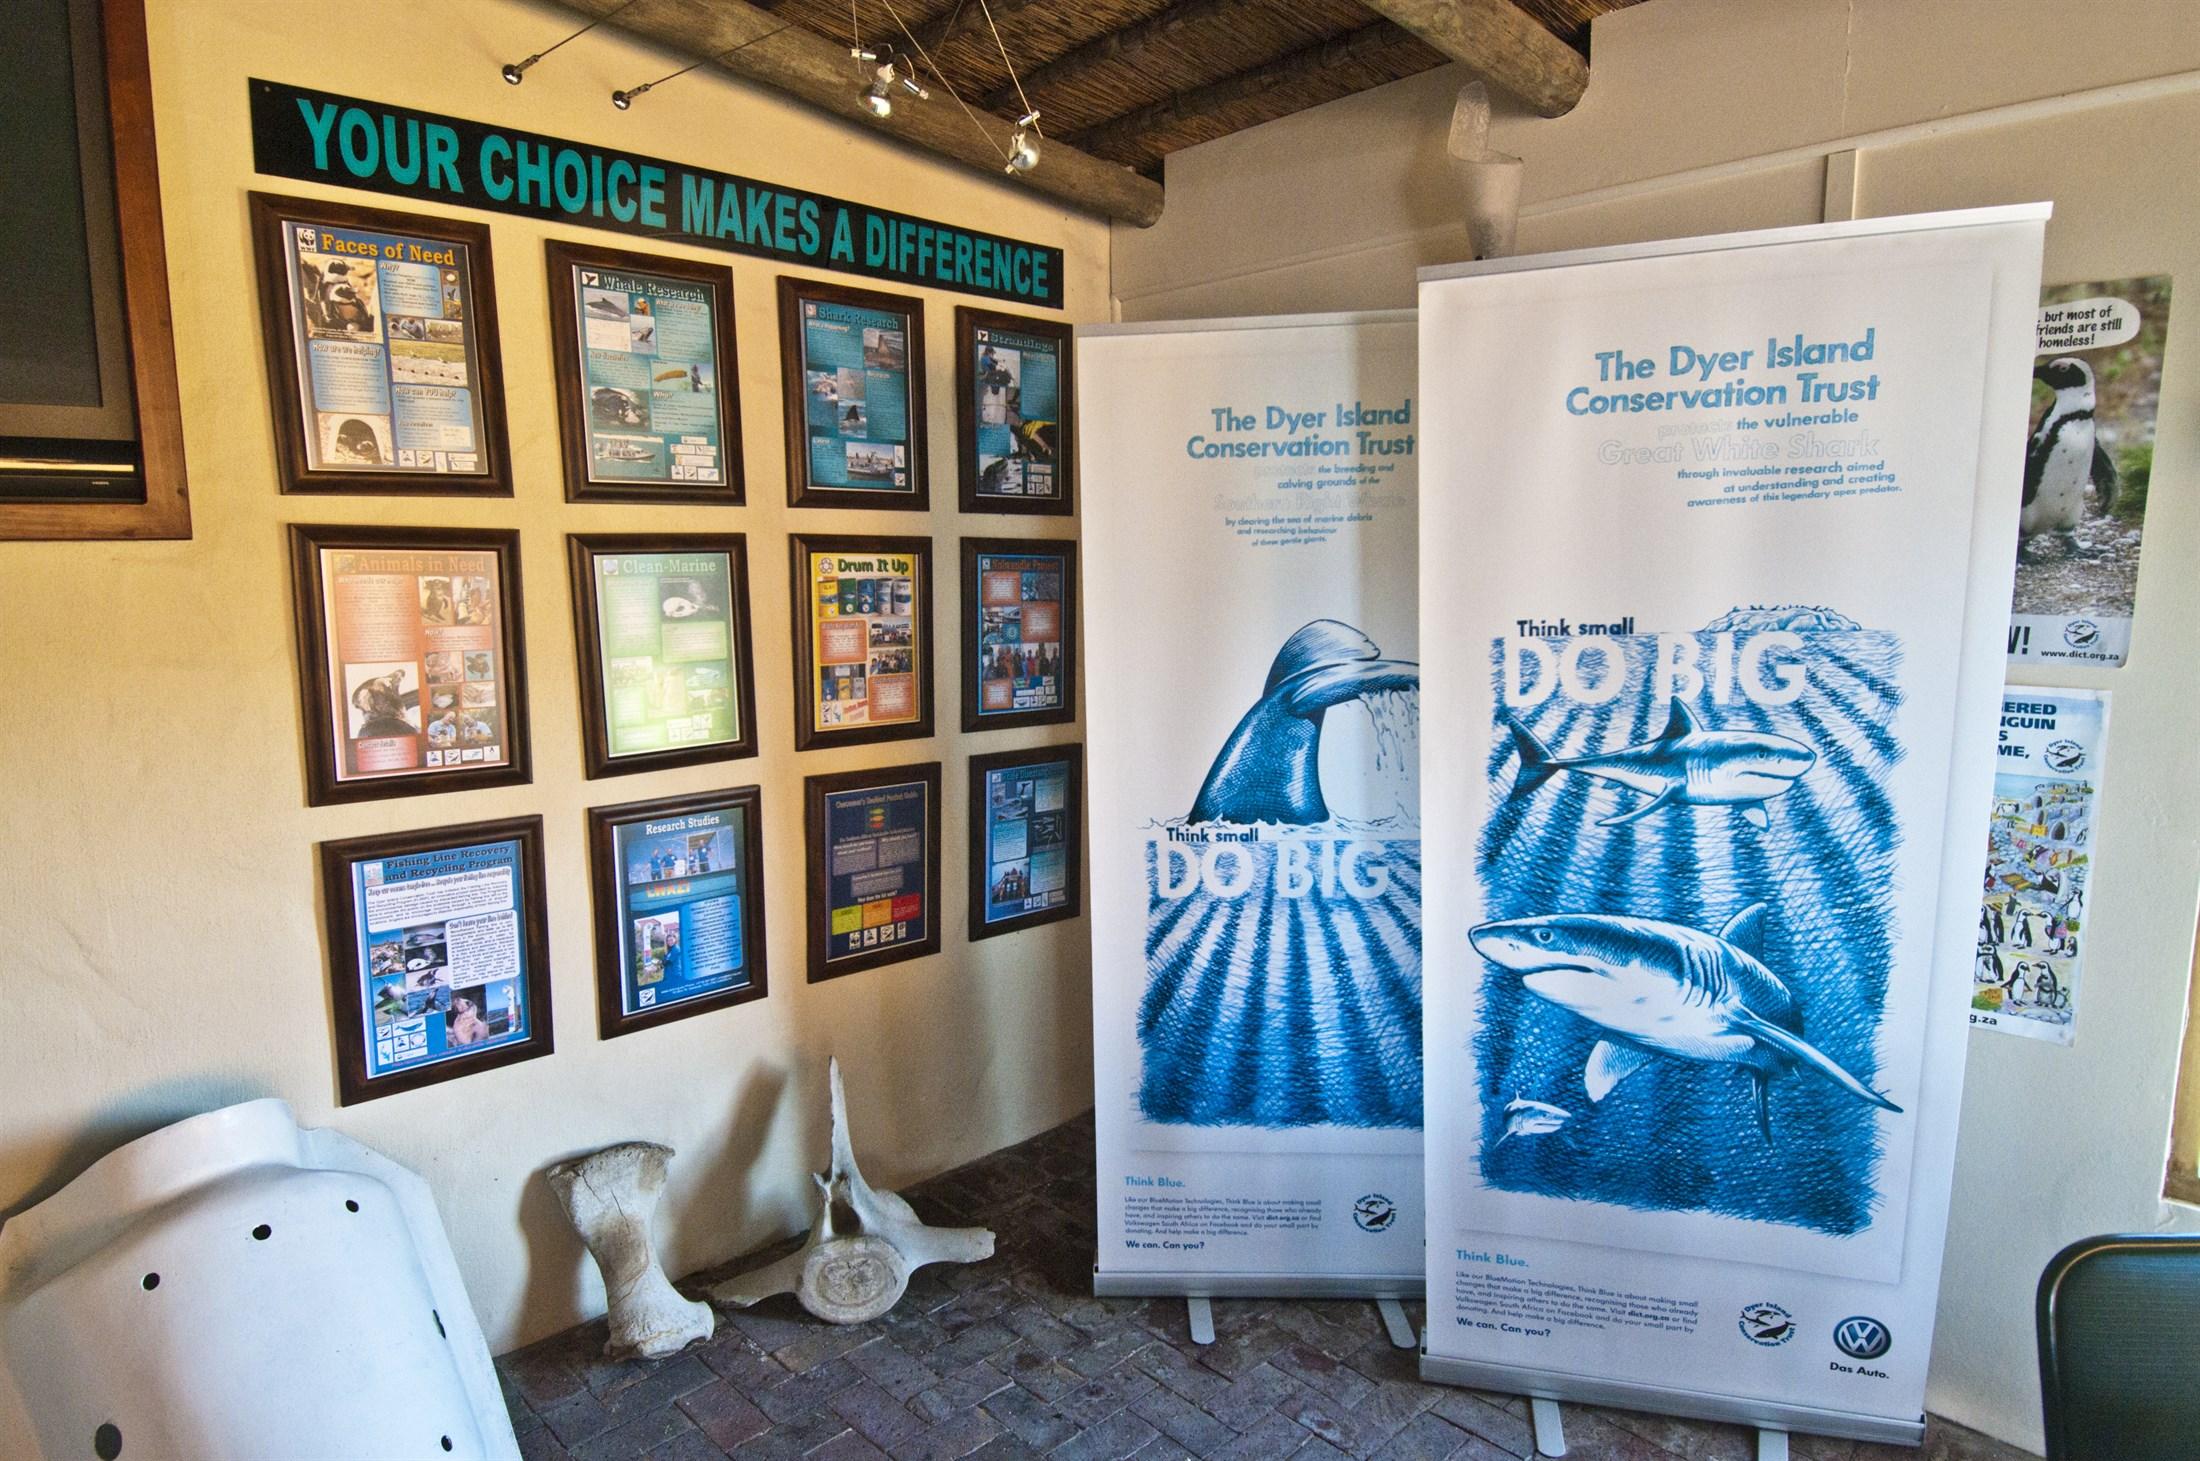 white-shark-tourism-gaansbaai-western-cape-south-africa_105b-2200x1461px